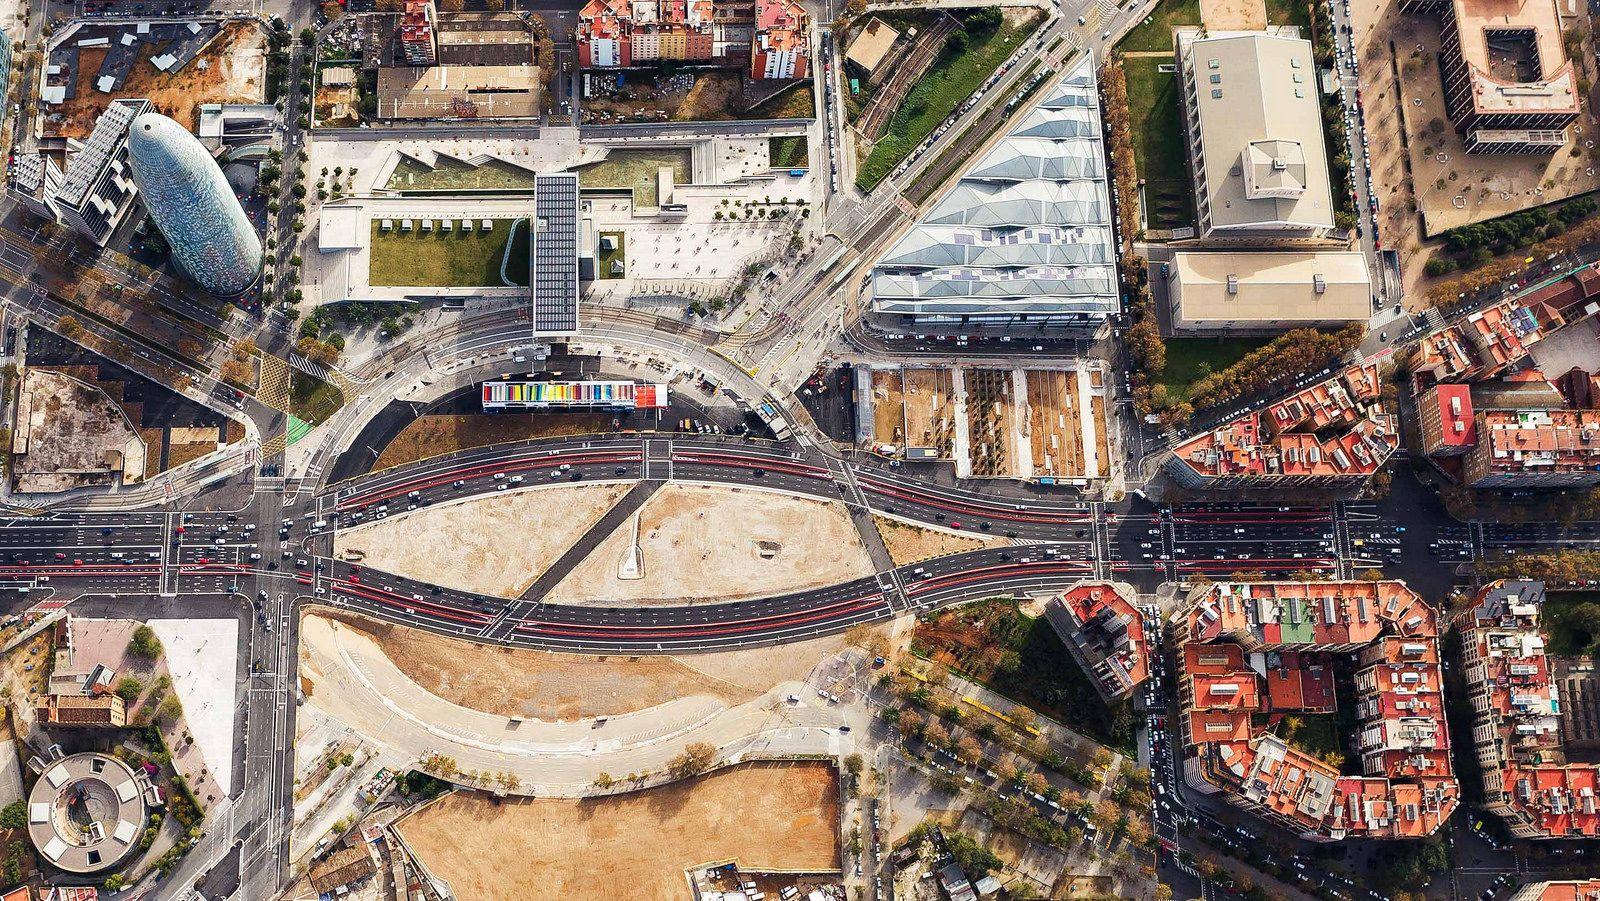 Plaça De Les Glories Desembre De 2014 Mataro Urban Planning Barcelona